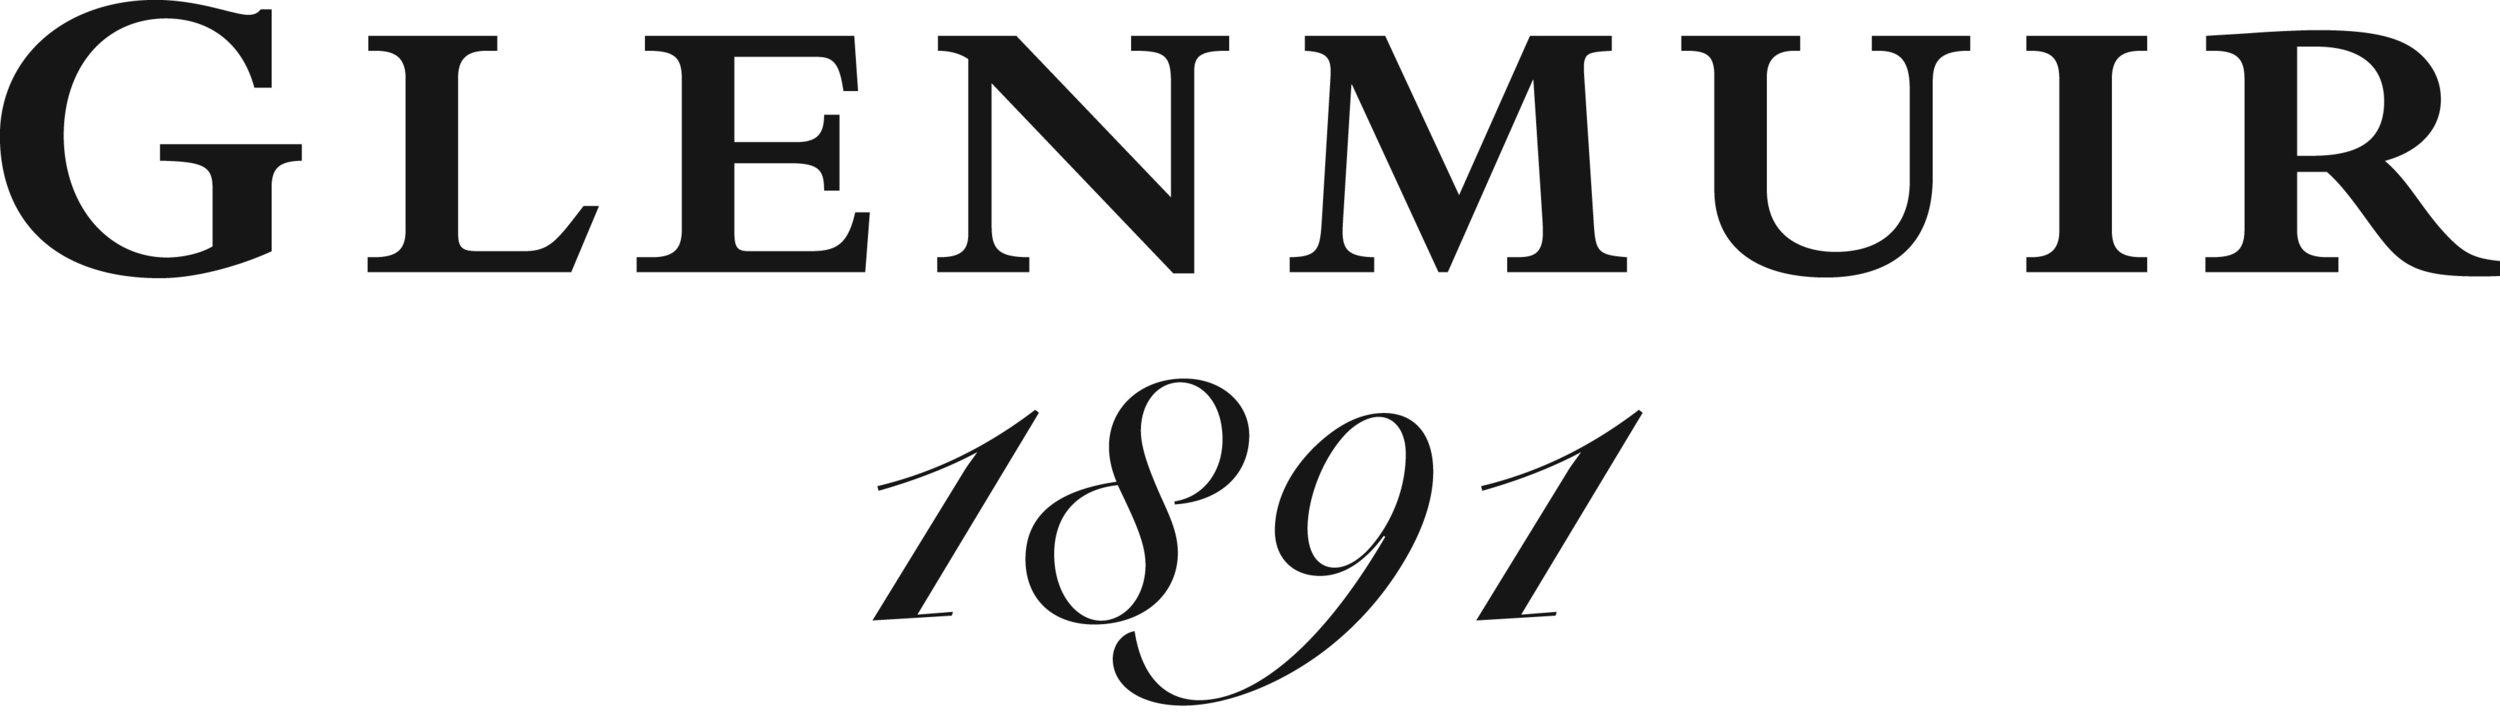 Glenmuir 1891 Script Logo large.jpg